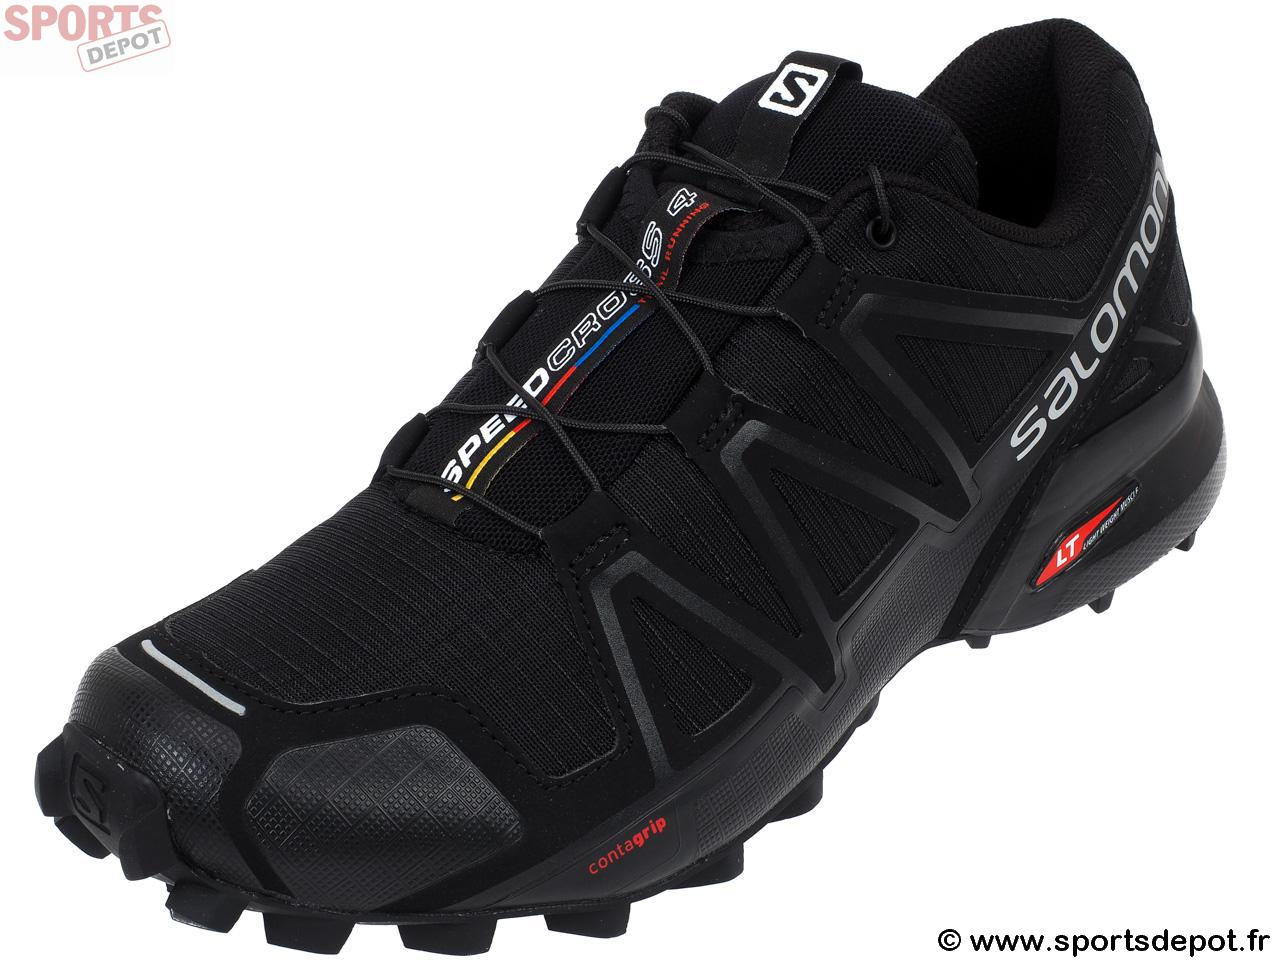 Chaussures Salomon Speedcross noires homme RQFlX1d